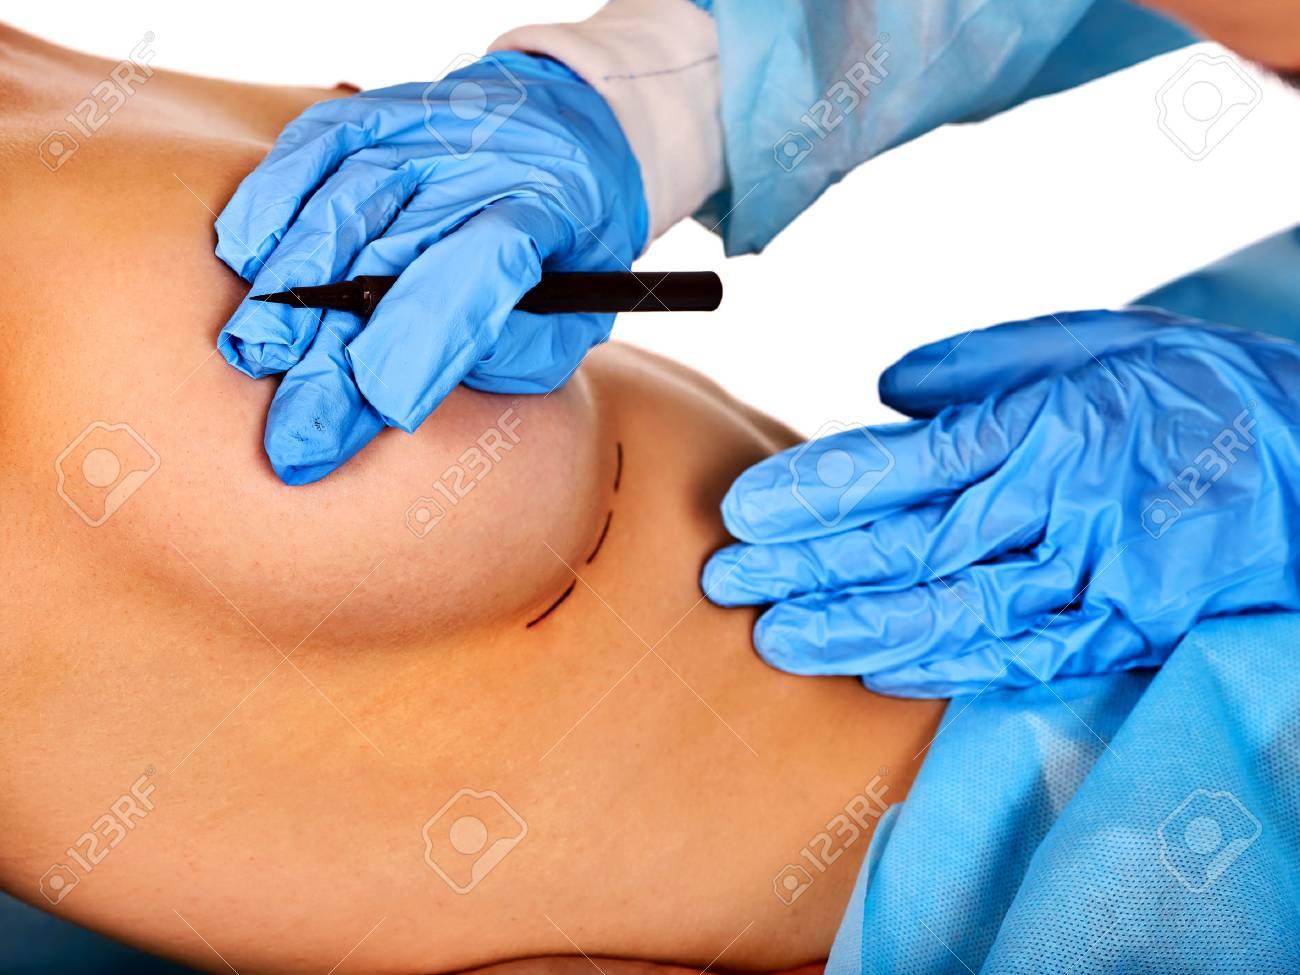 Female breast transplant